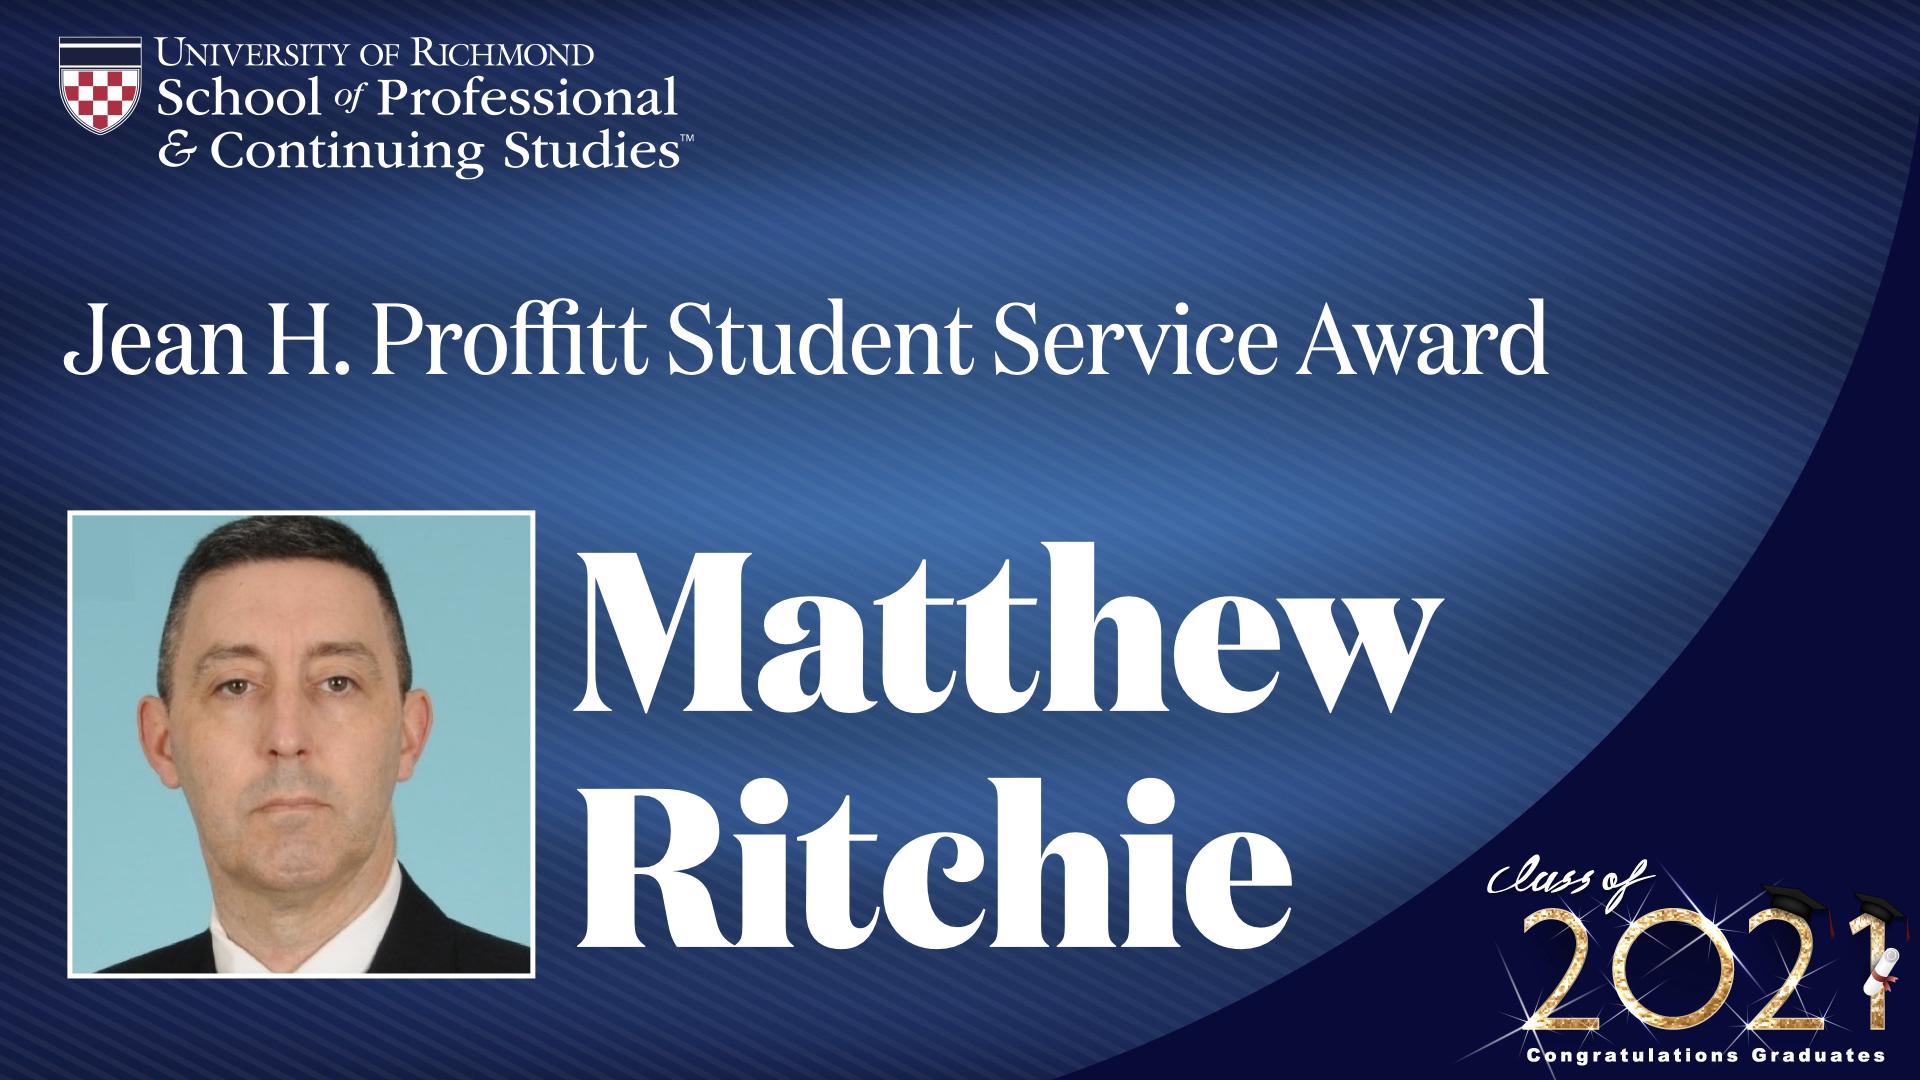 Matthew Ritchie headshot and award name